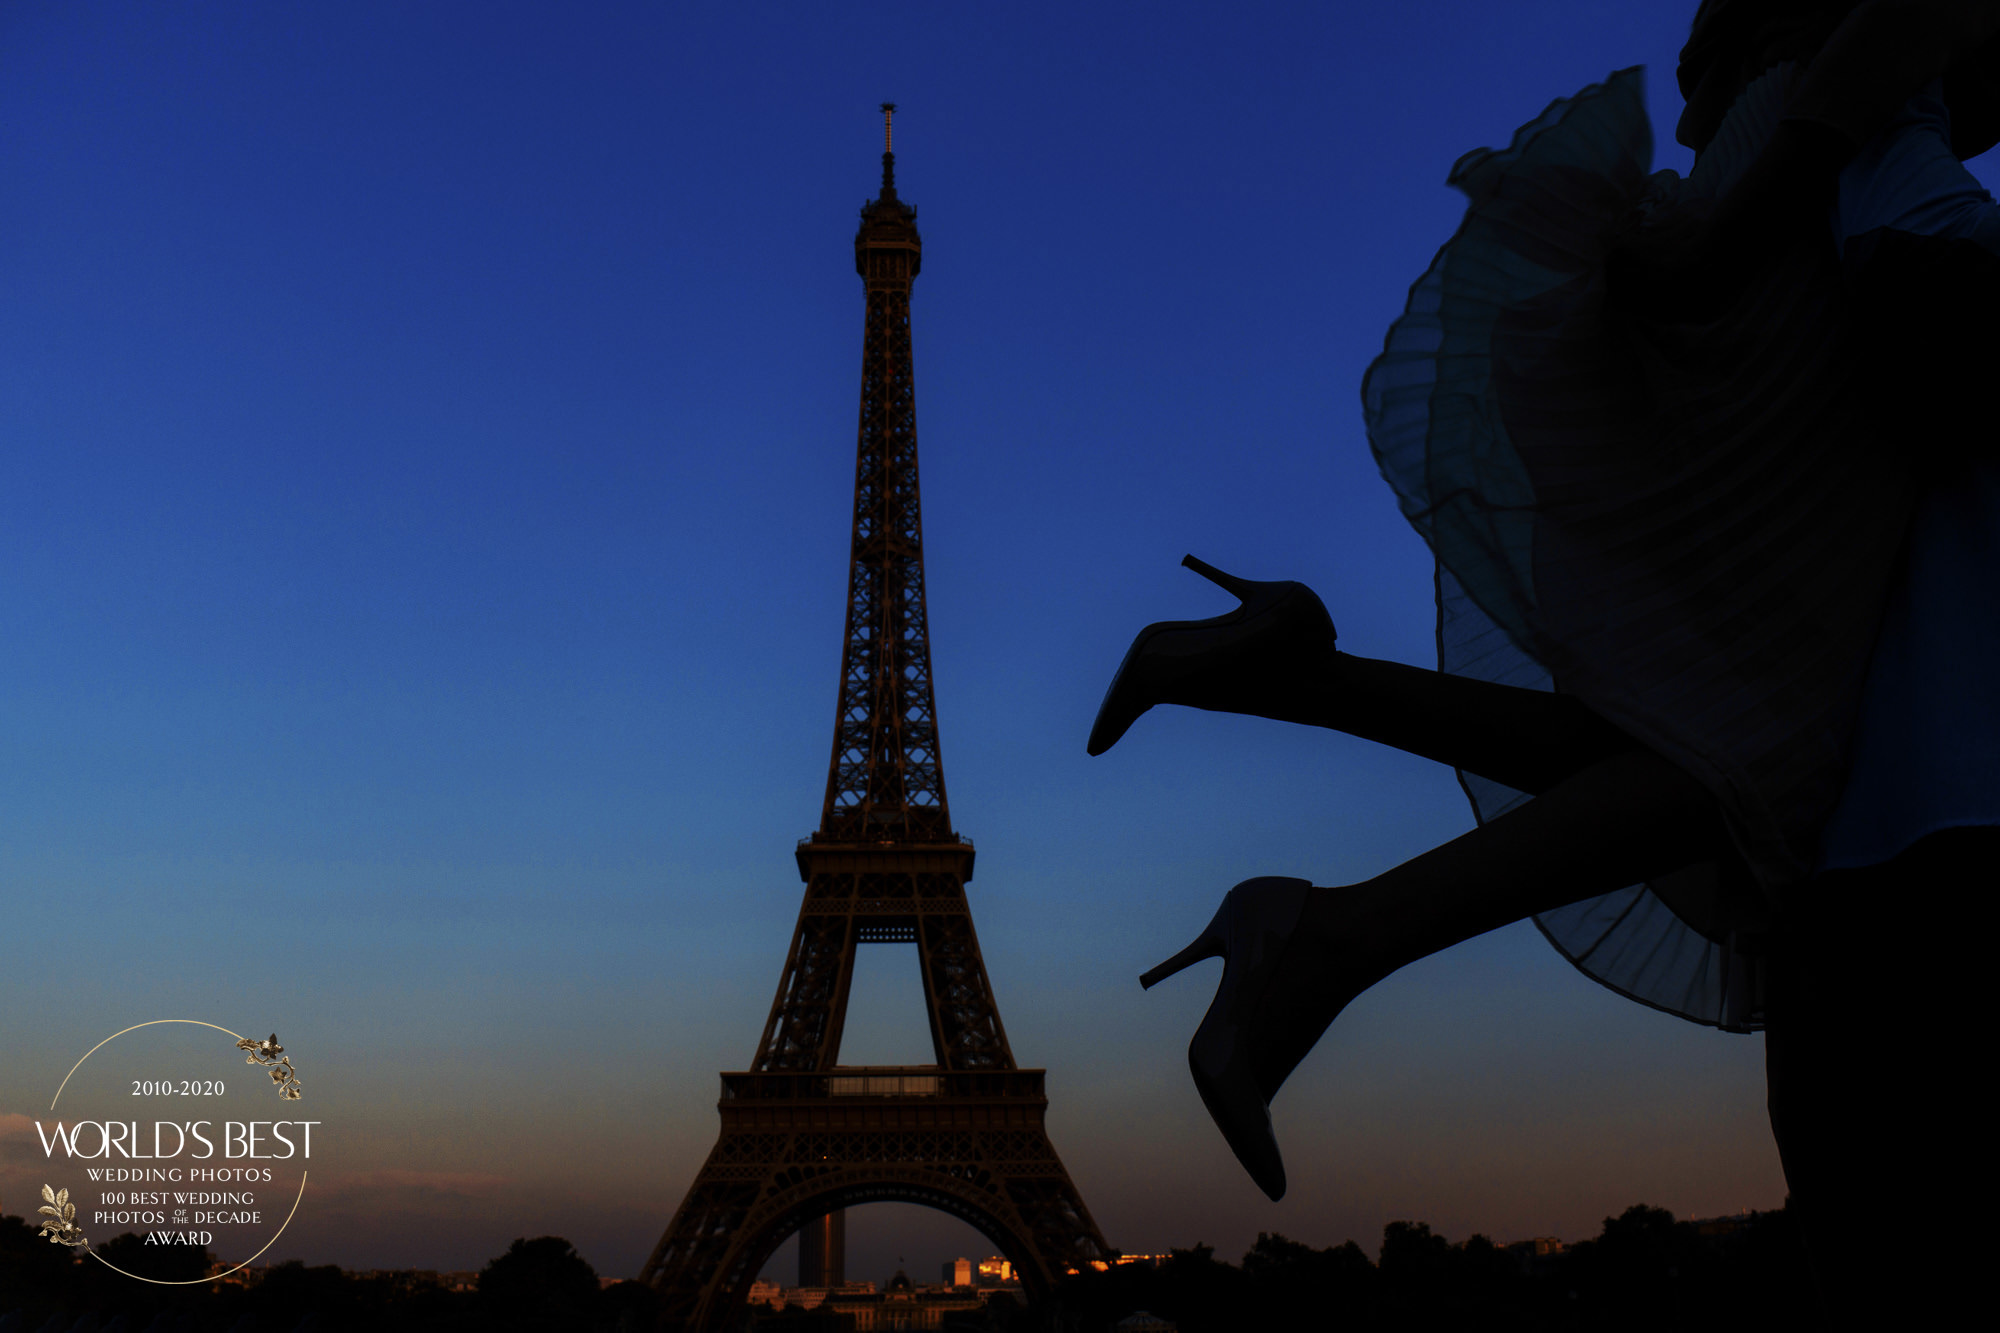 Award-winng silhouette in front of the Eiffel Tower by Look Fotografia - Los Angeles